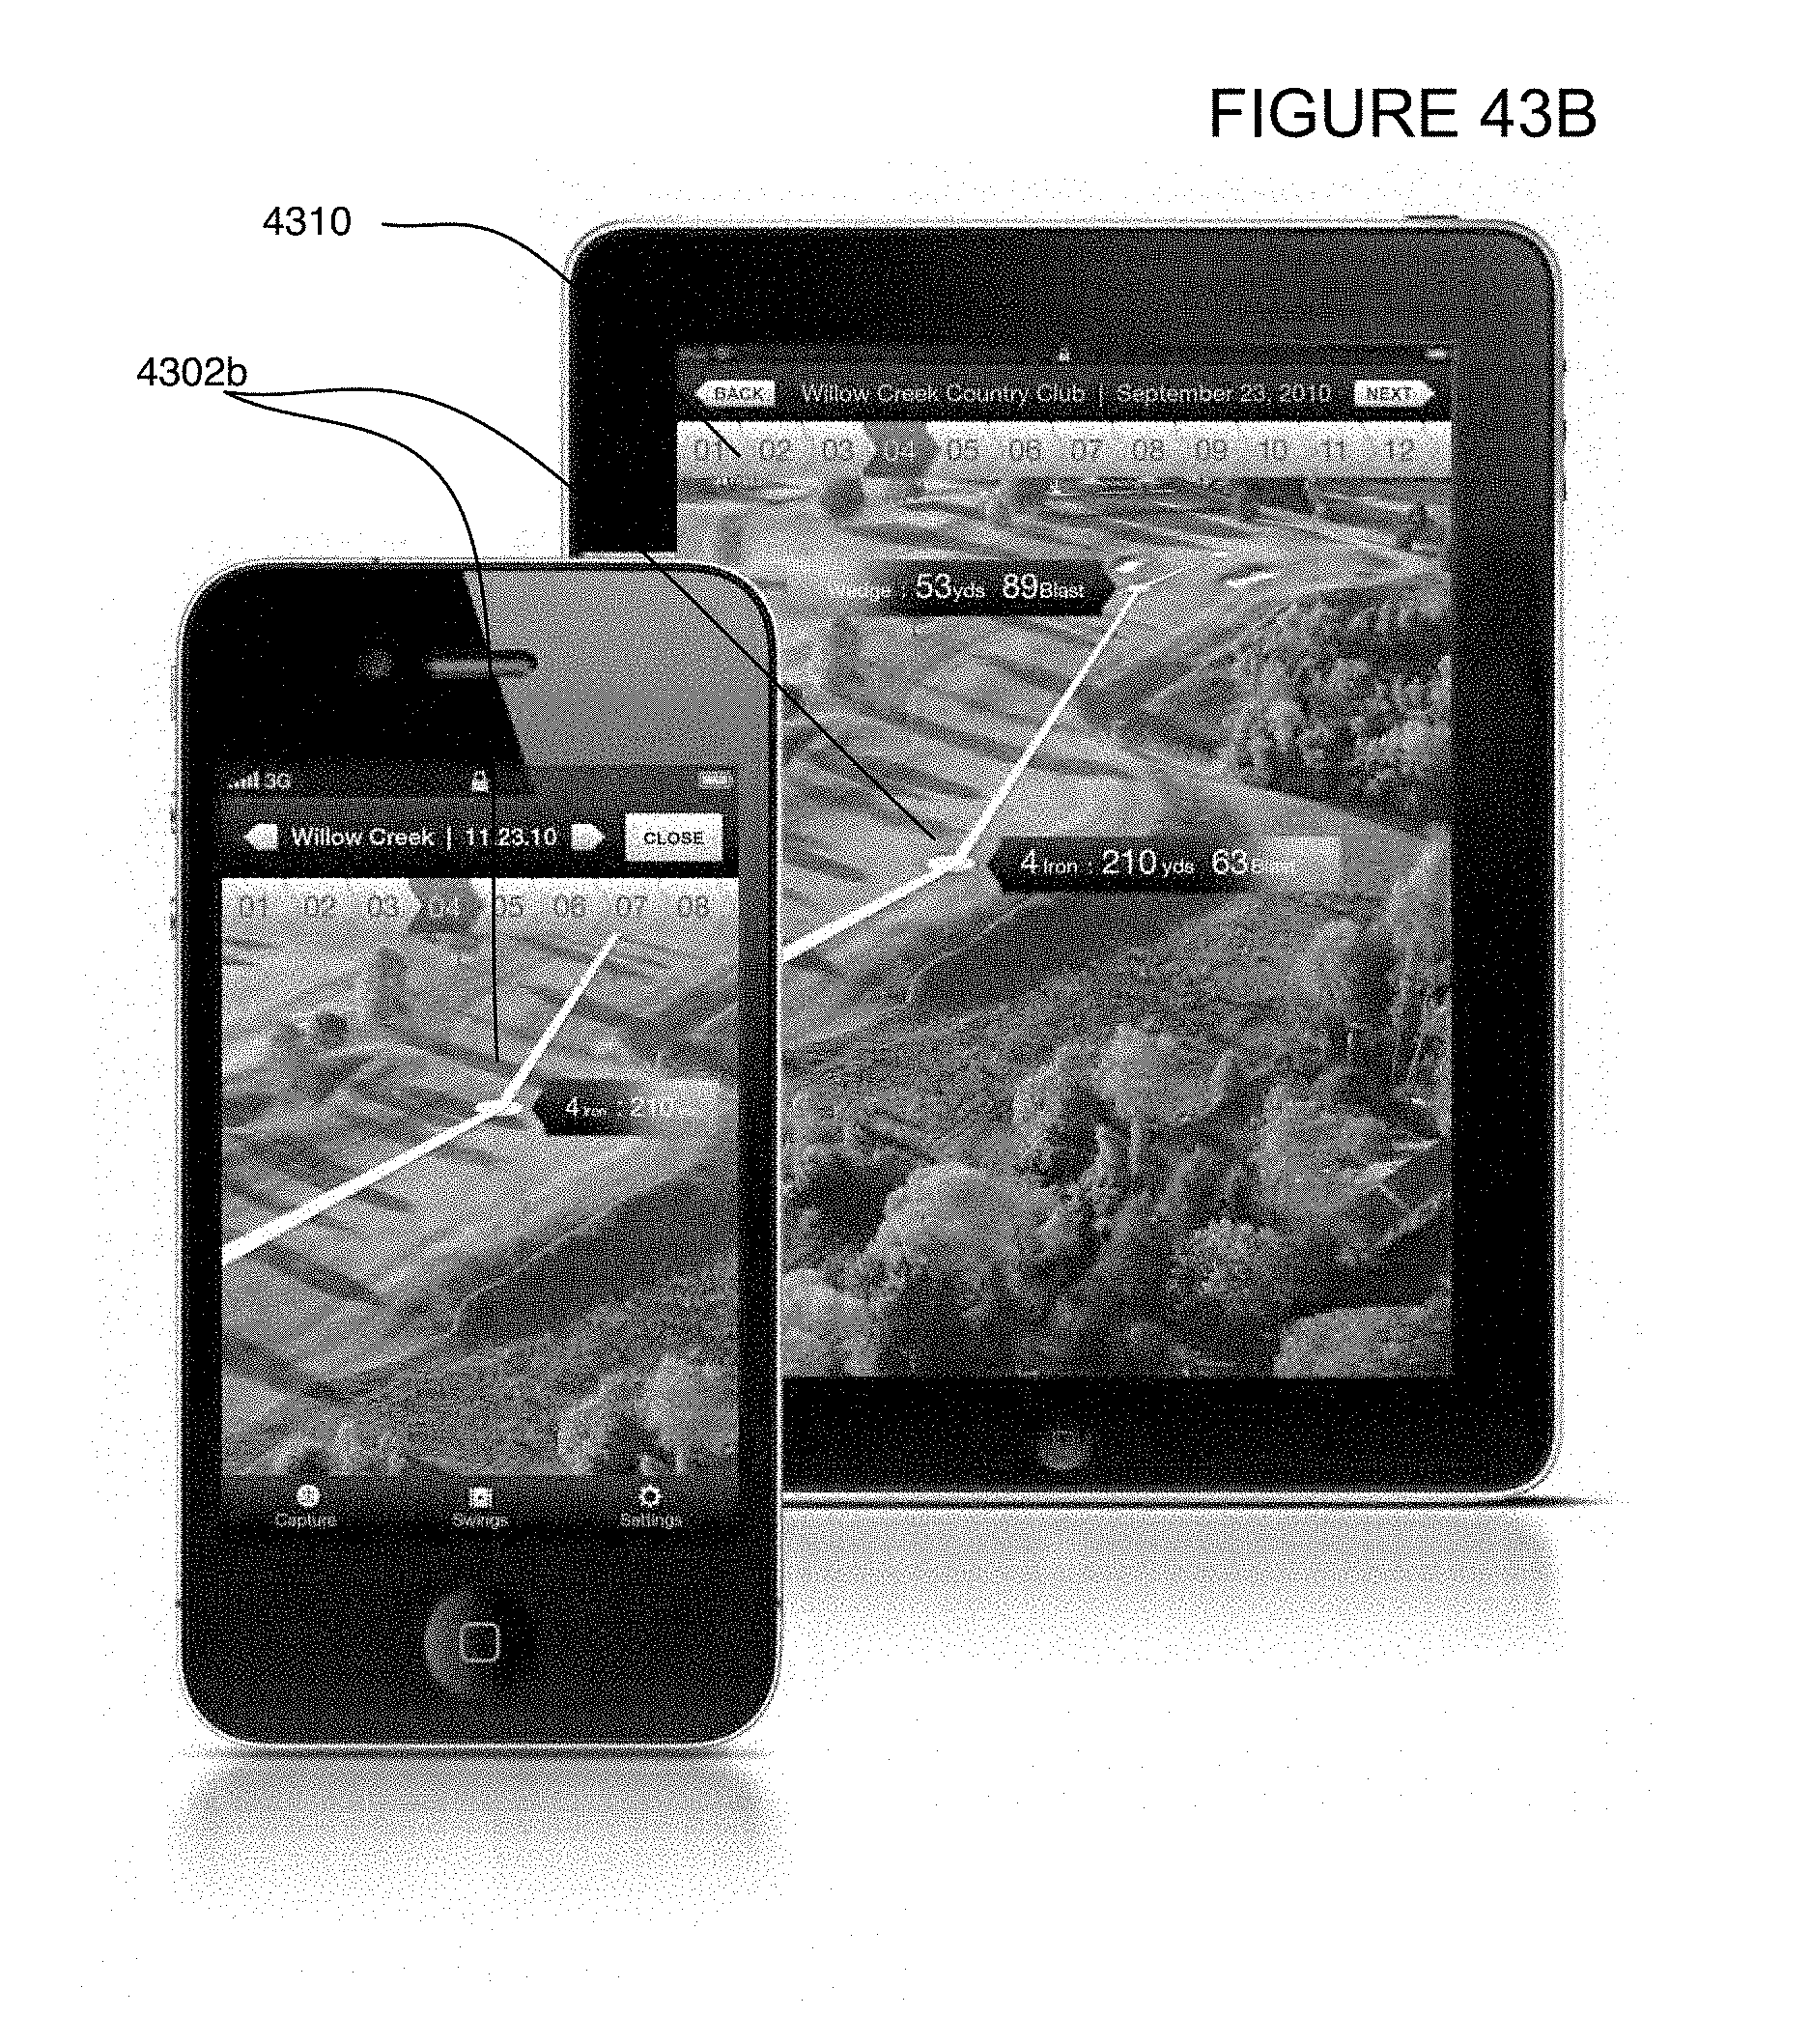 Patent US 9,824,264 B2